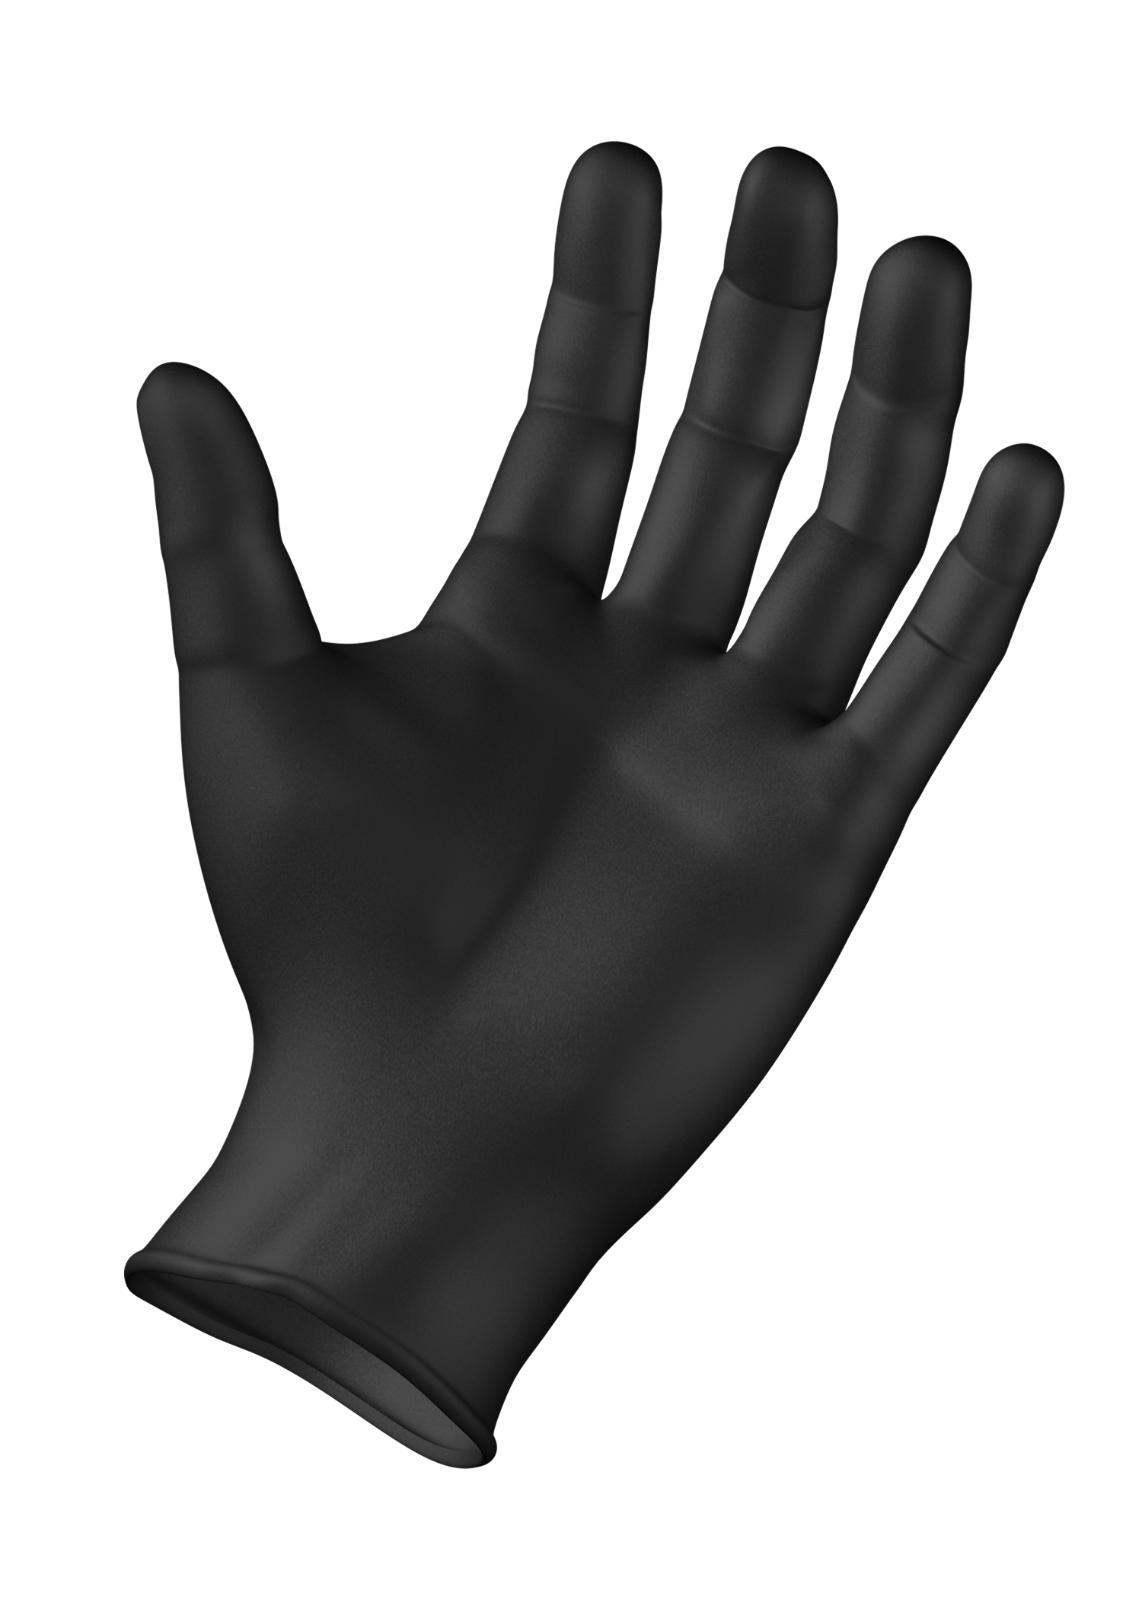 Starmed Glove Size Bx 300